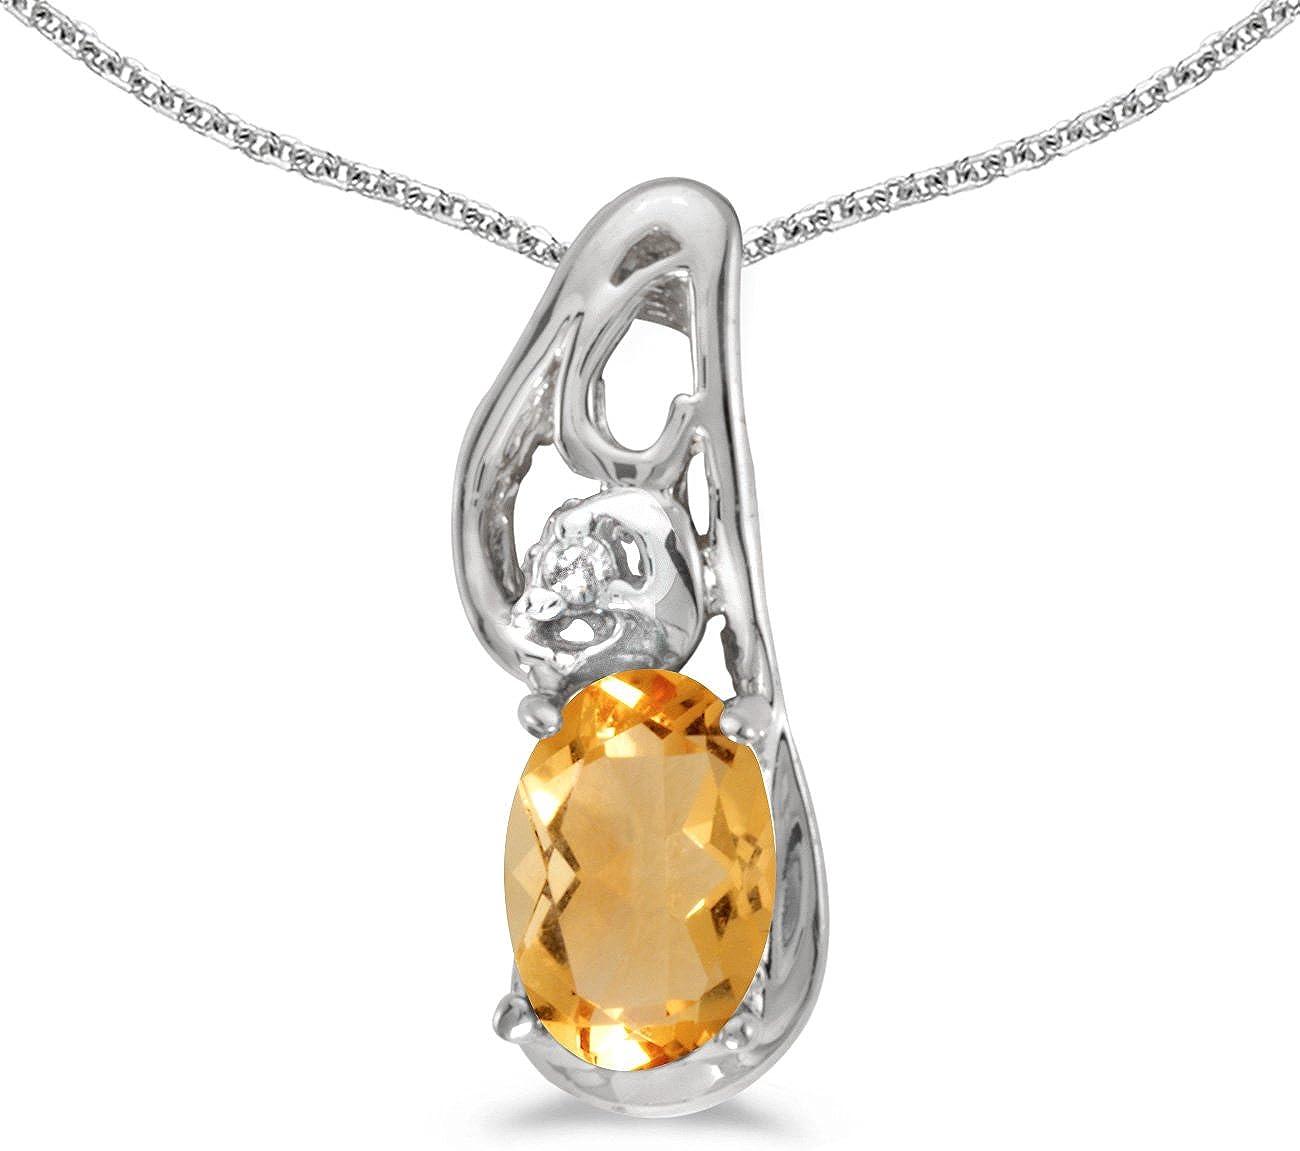 10k Yellow Gold Oval Garnet And Diamond Pendant